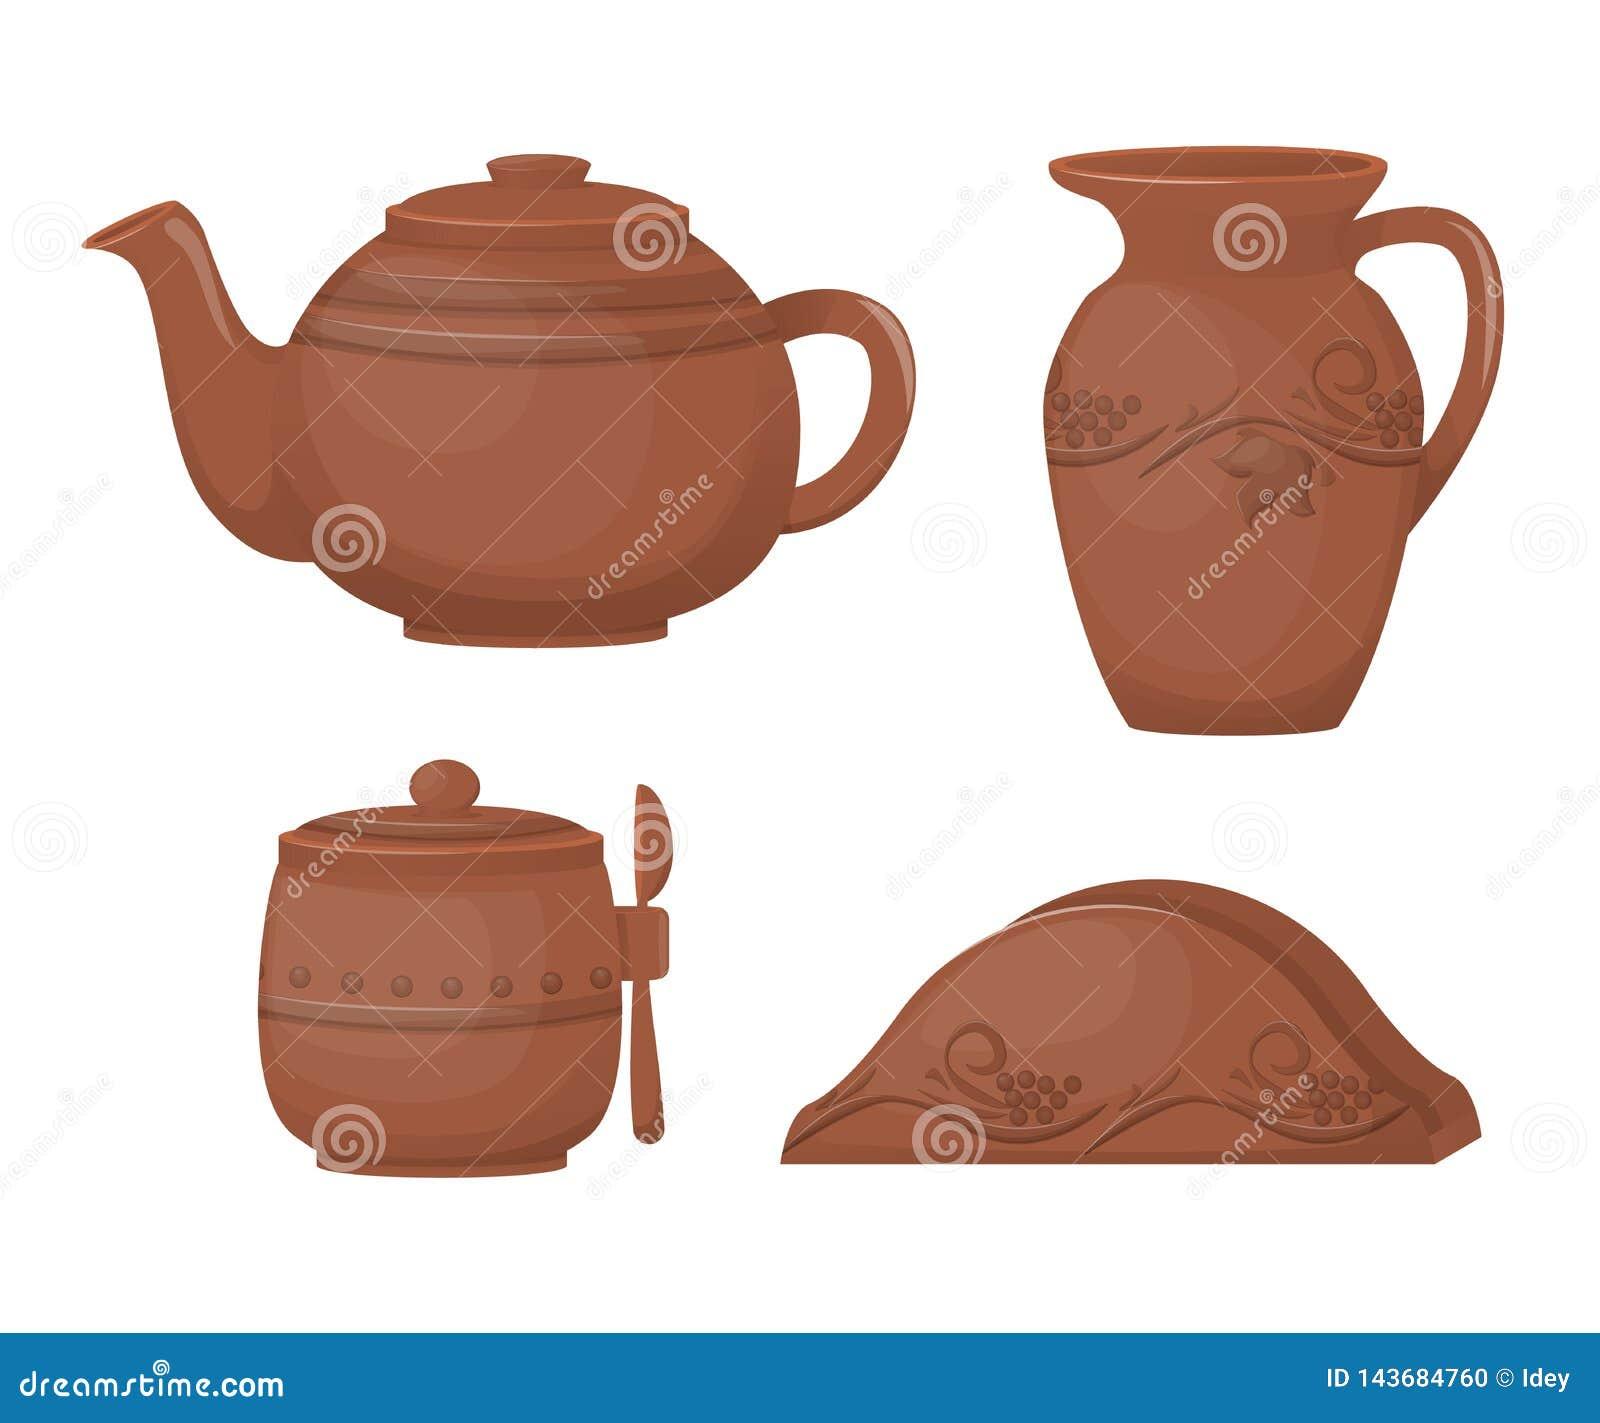 Ceramic Pottery Beautiful Kitchenware Ceramic Tea Set With Decorative Ornament Stock Vector Illustration Of Decoration Milk 143684760